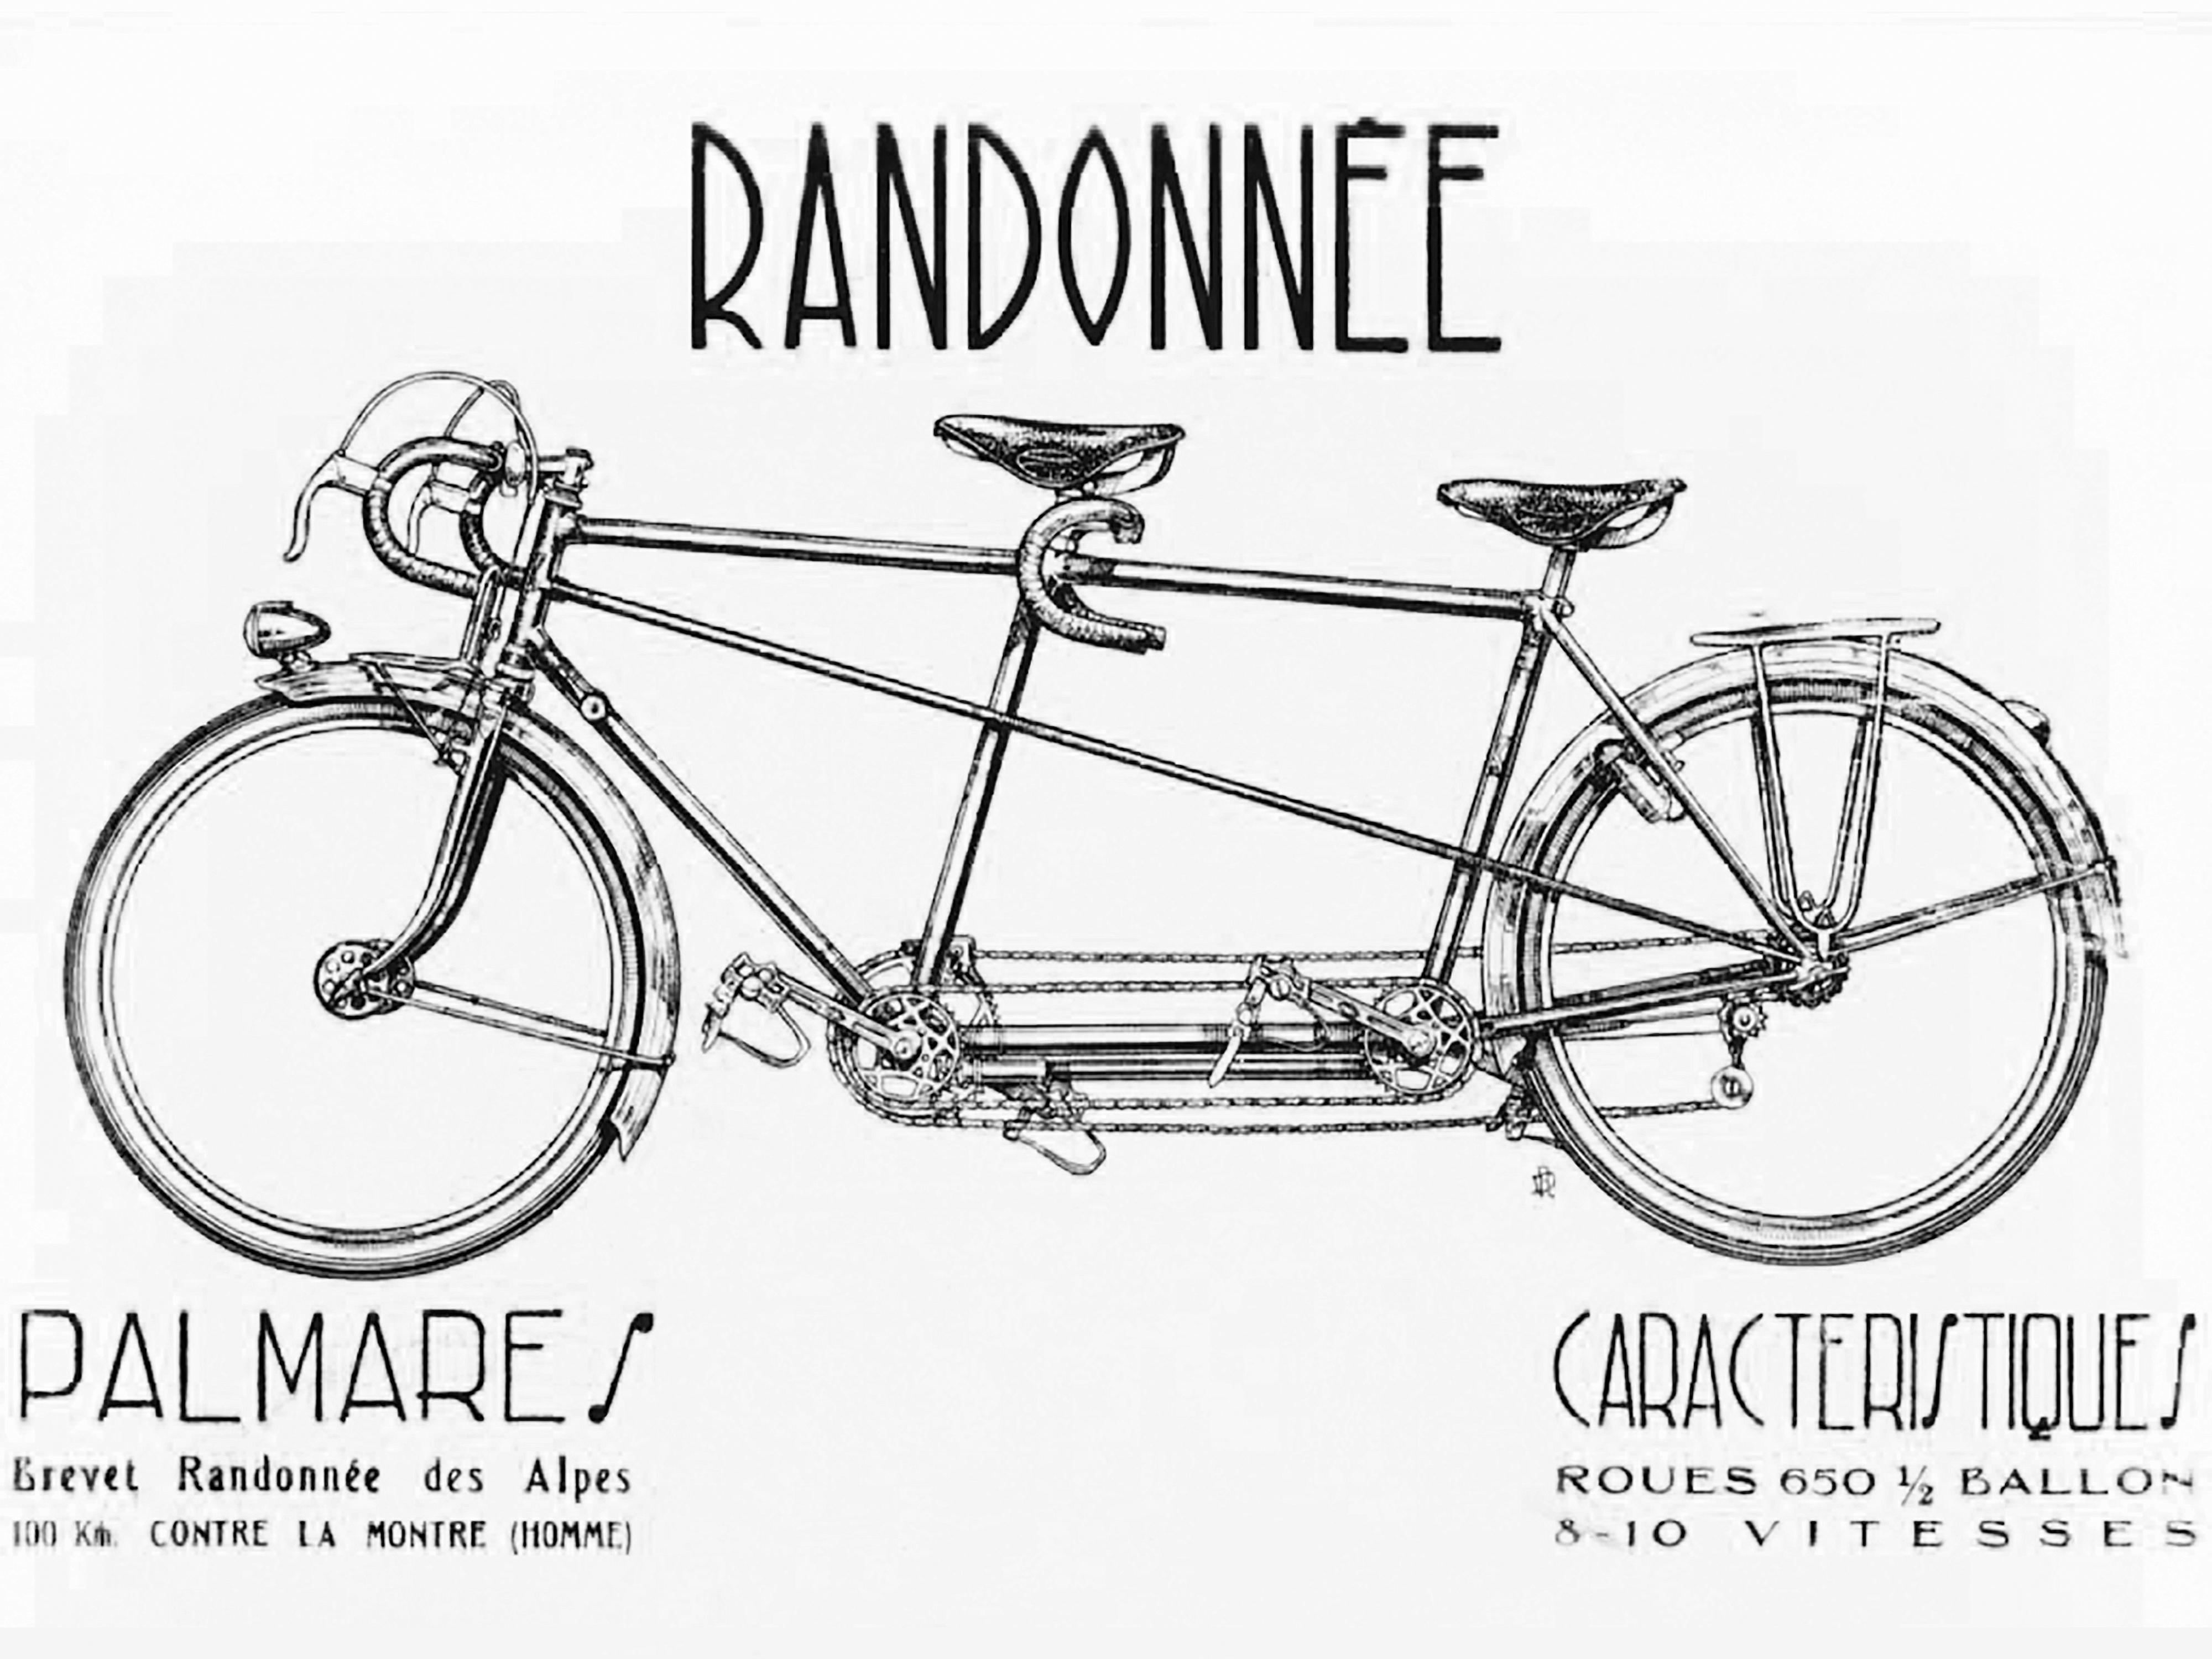 ebykr-cycles-alex-singer-randonnee-tandem-1950-1951-catalog